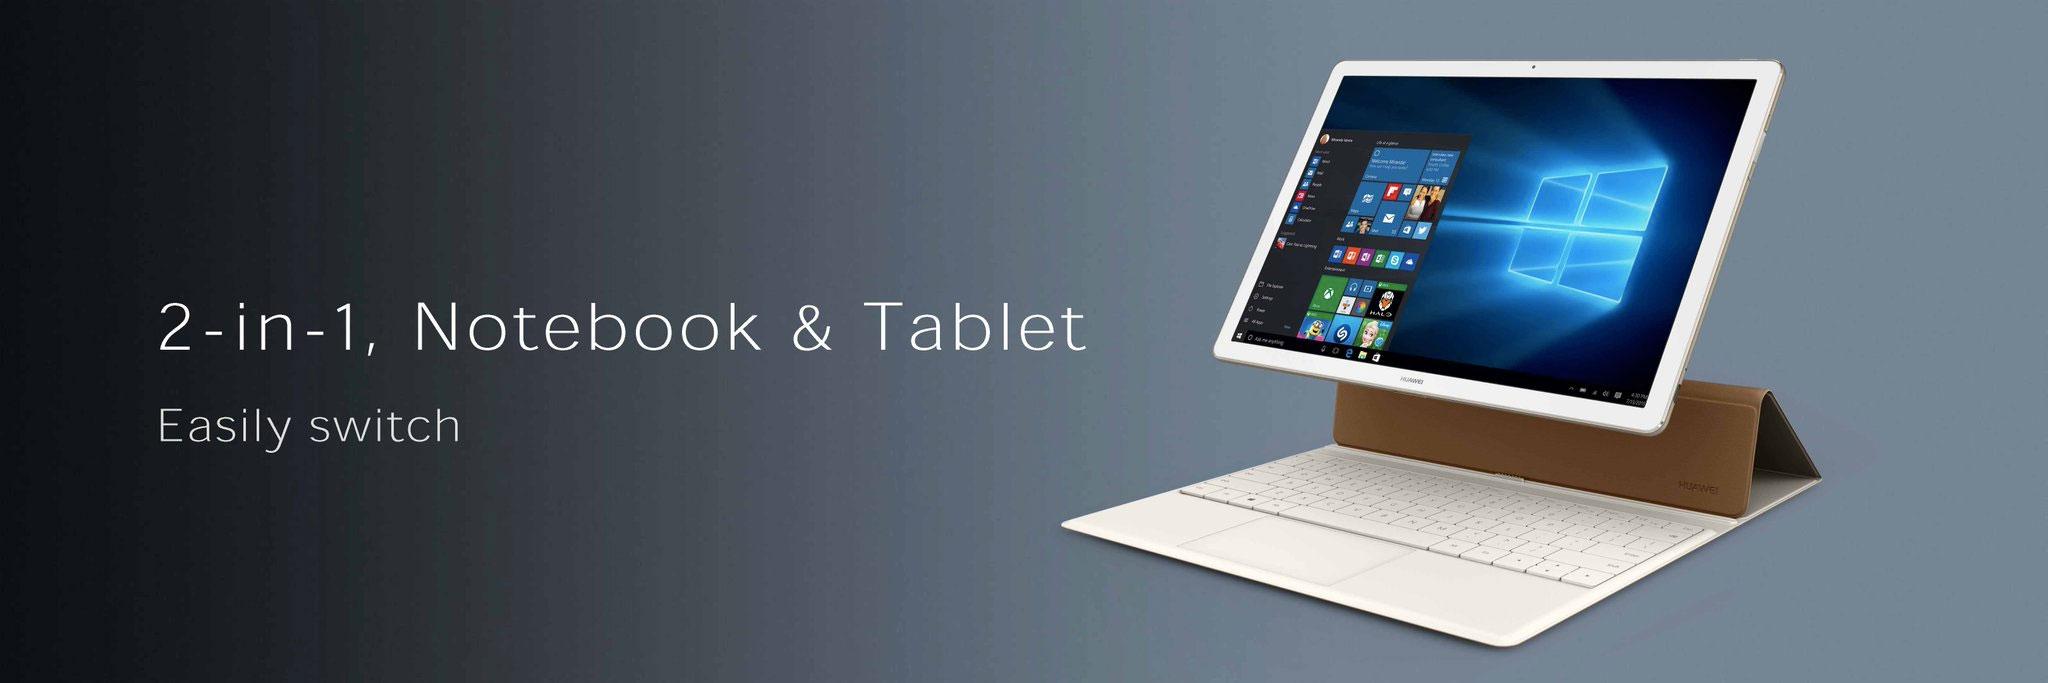 MWC 2016 : Huawei MateBook, avec ses faux airs de Surface